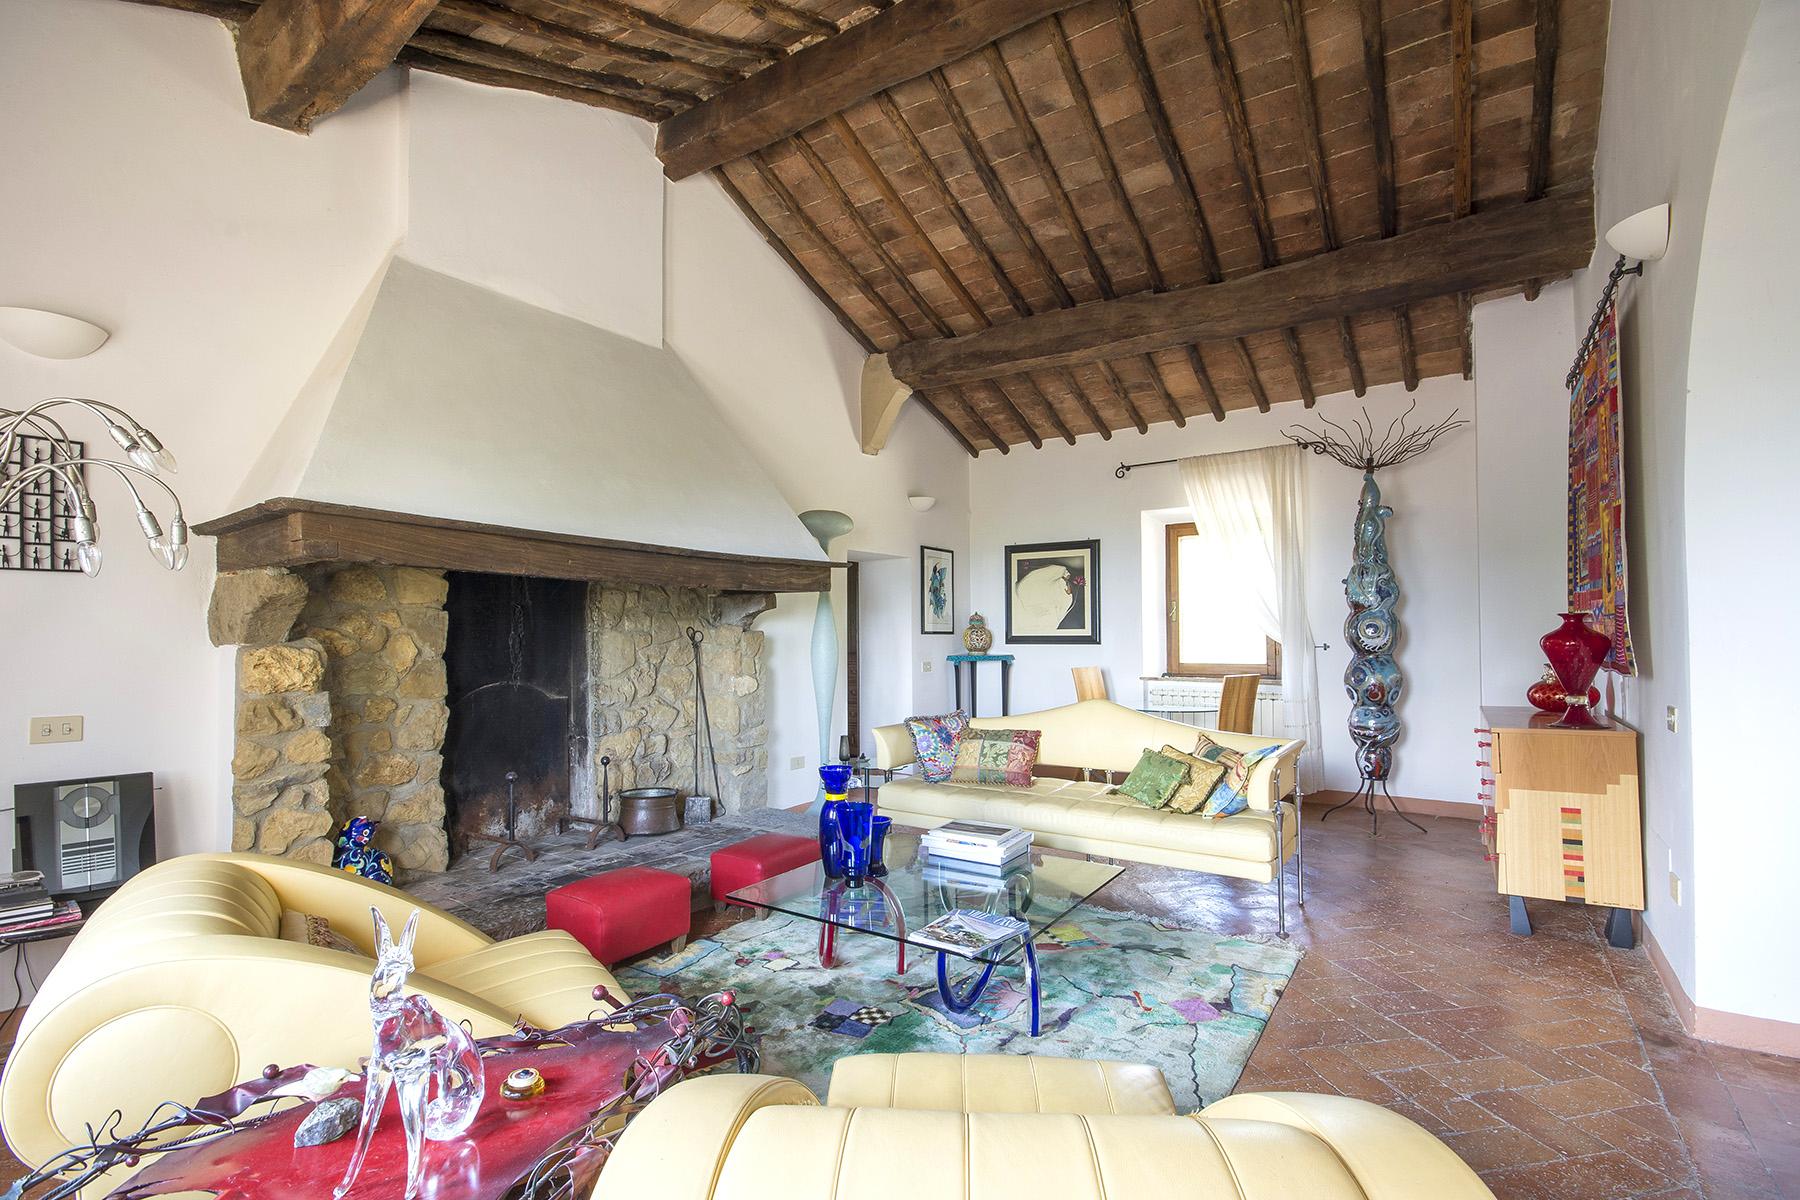 Casa indipendente in Vendita a Pienza: 5 locali, 400 mq - Foto 16